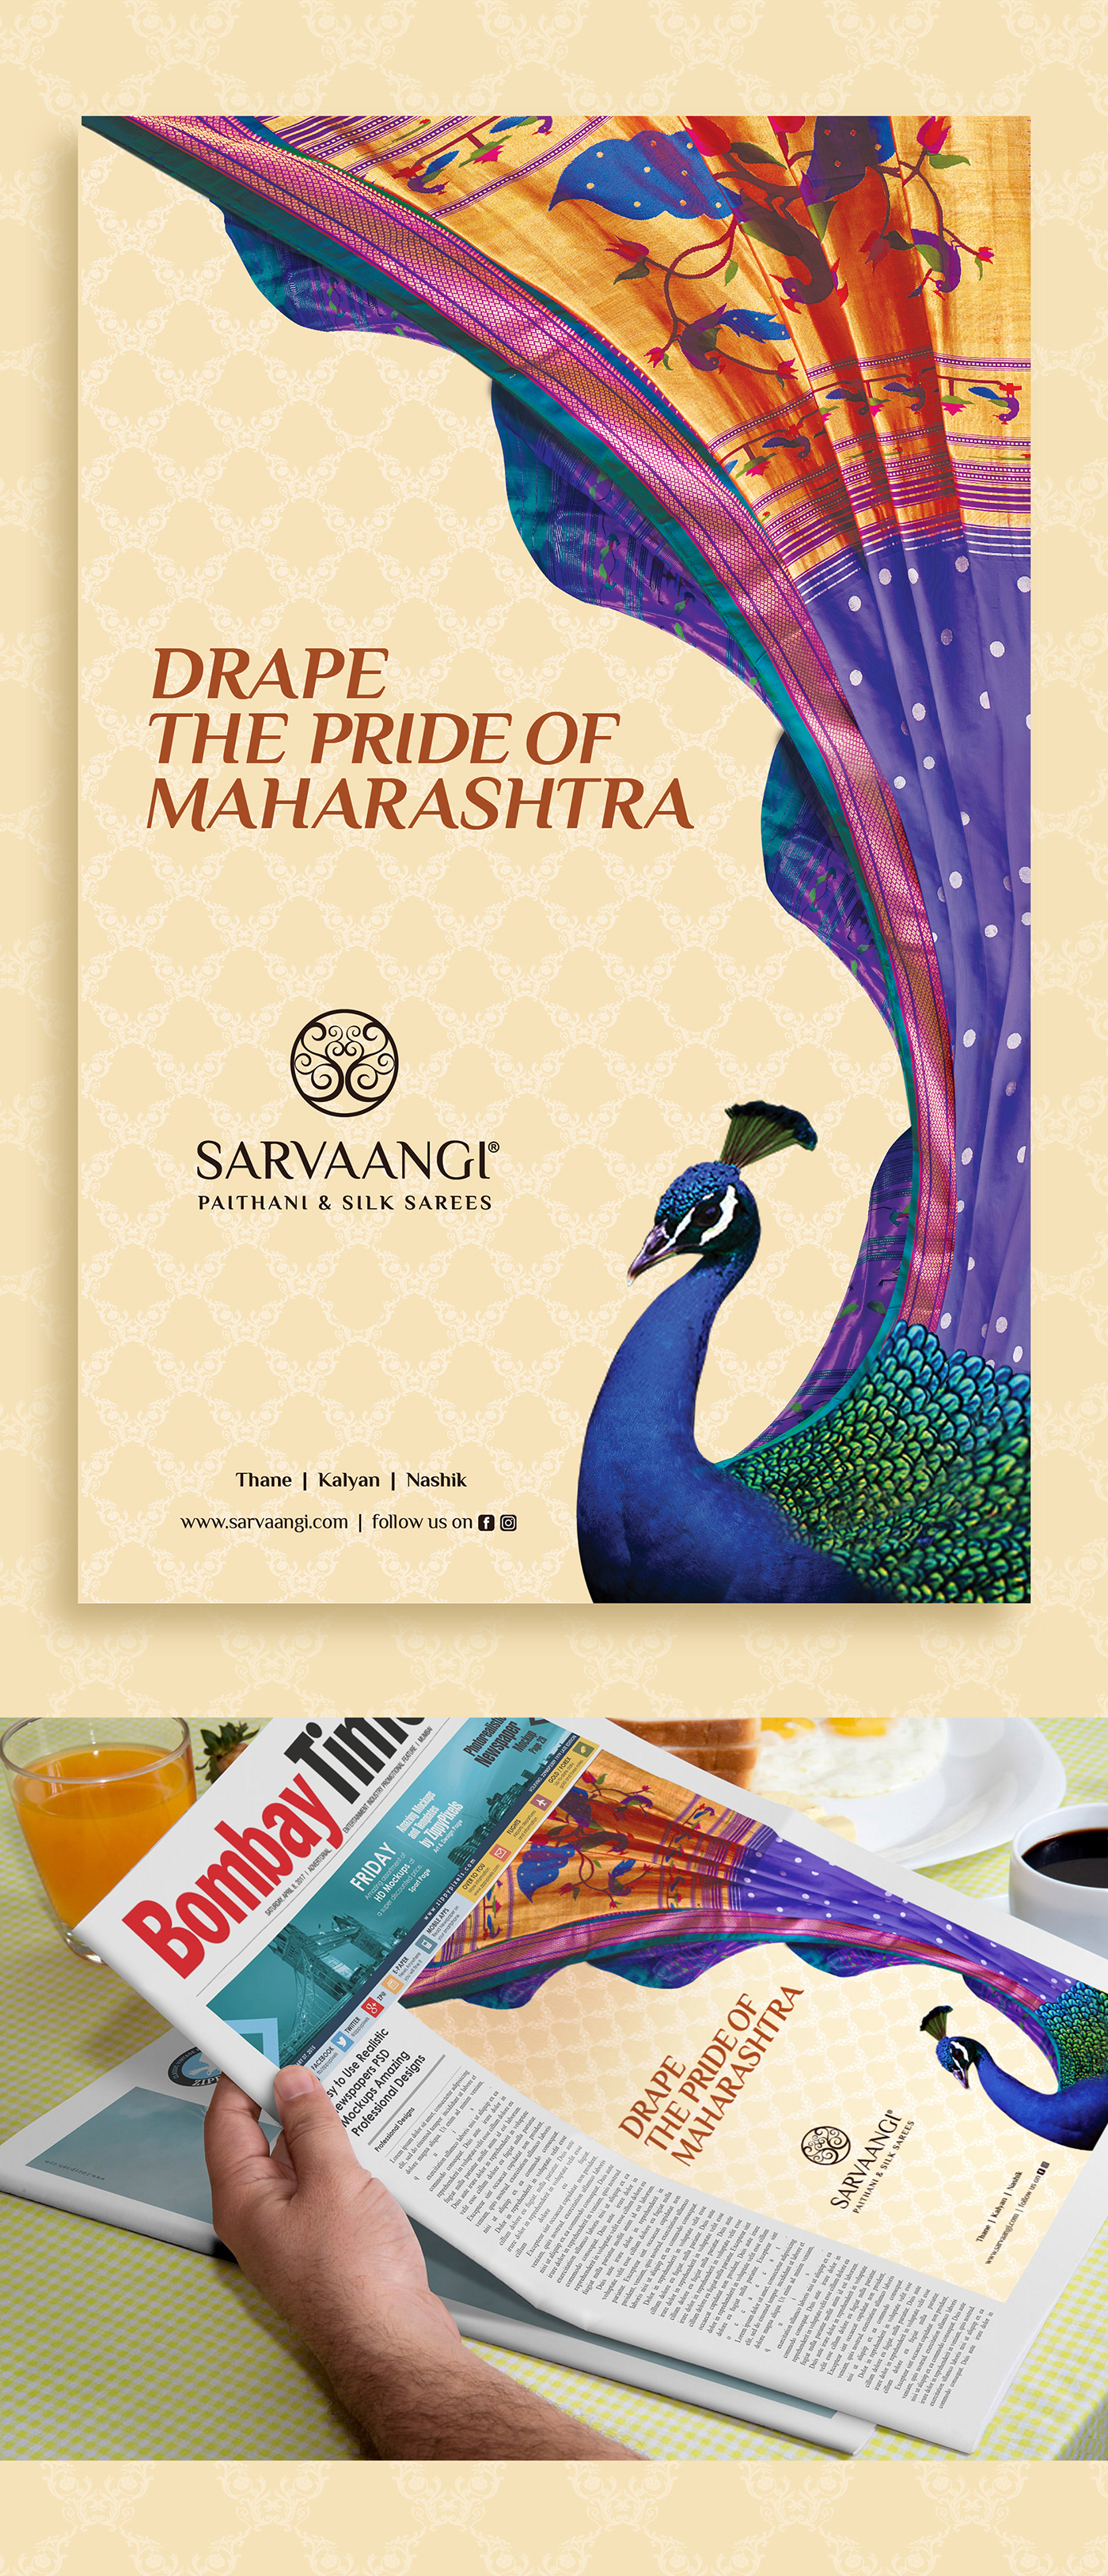 sarvaangi,saree,bombaytimes,AuthenticIndian,indian,culture,paithani,Maharashtra,Startup Farms